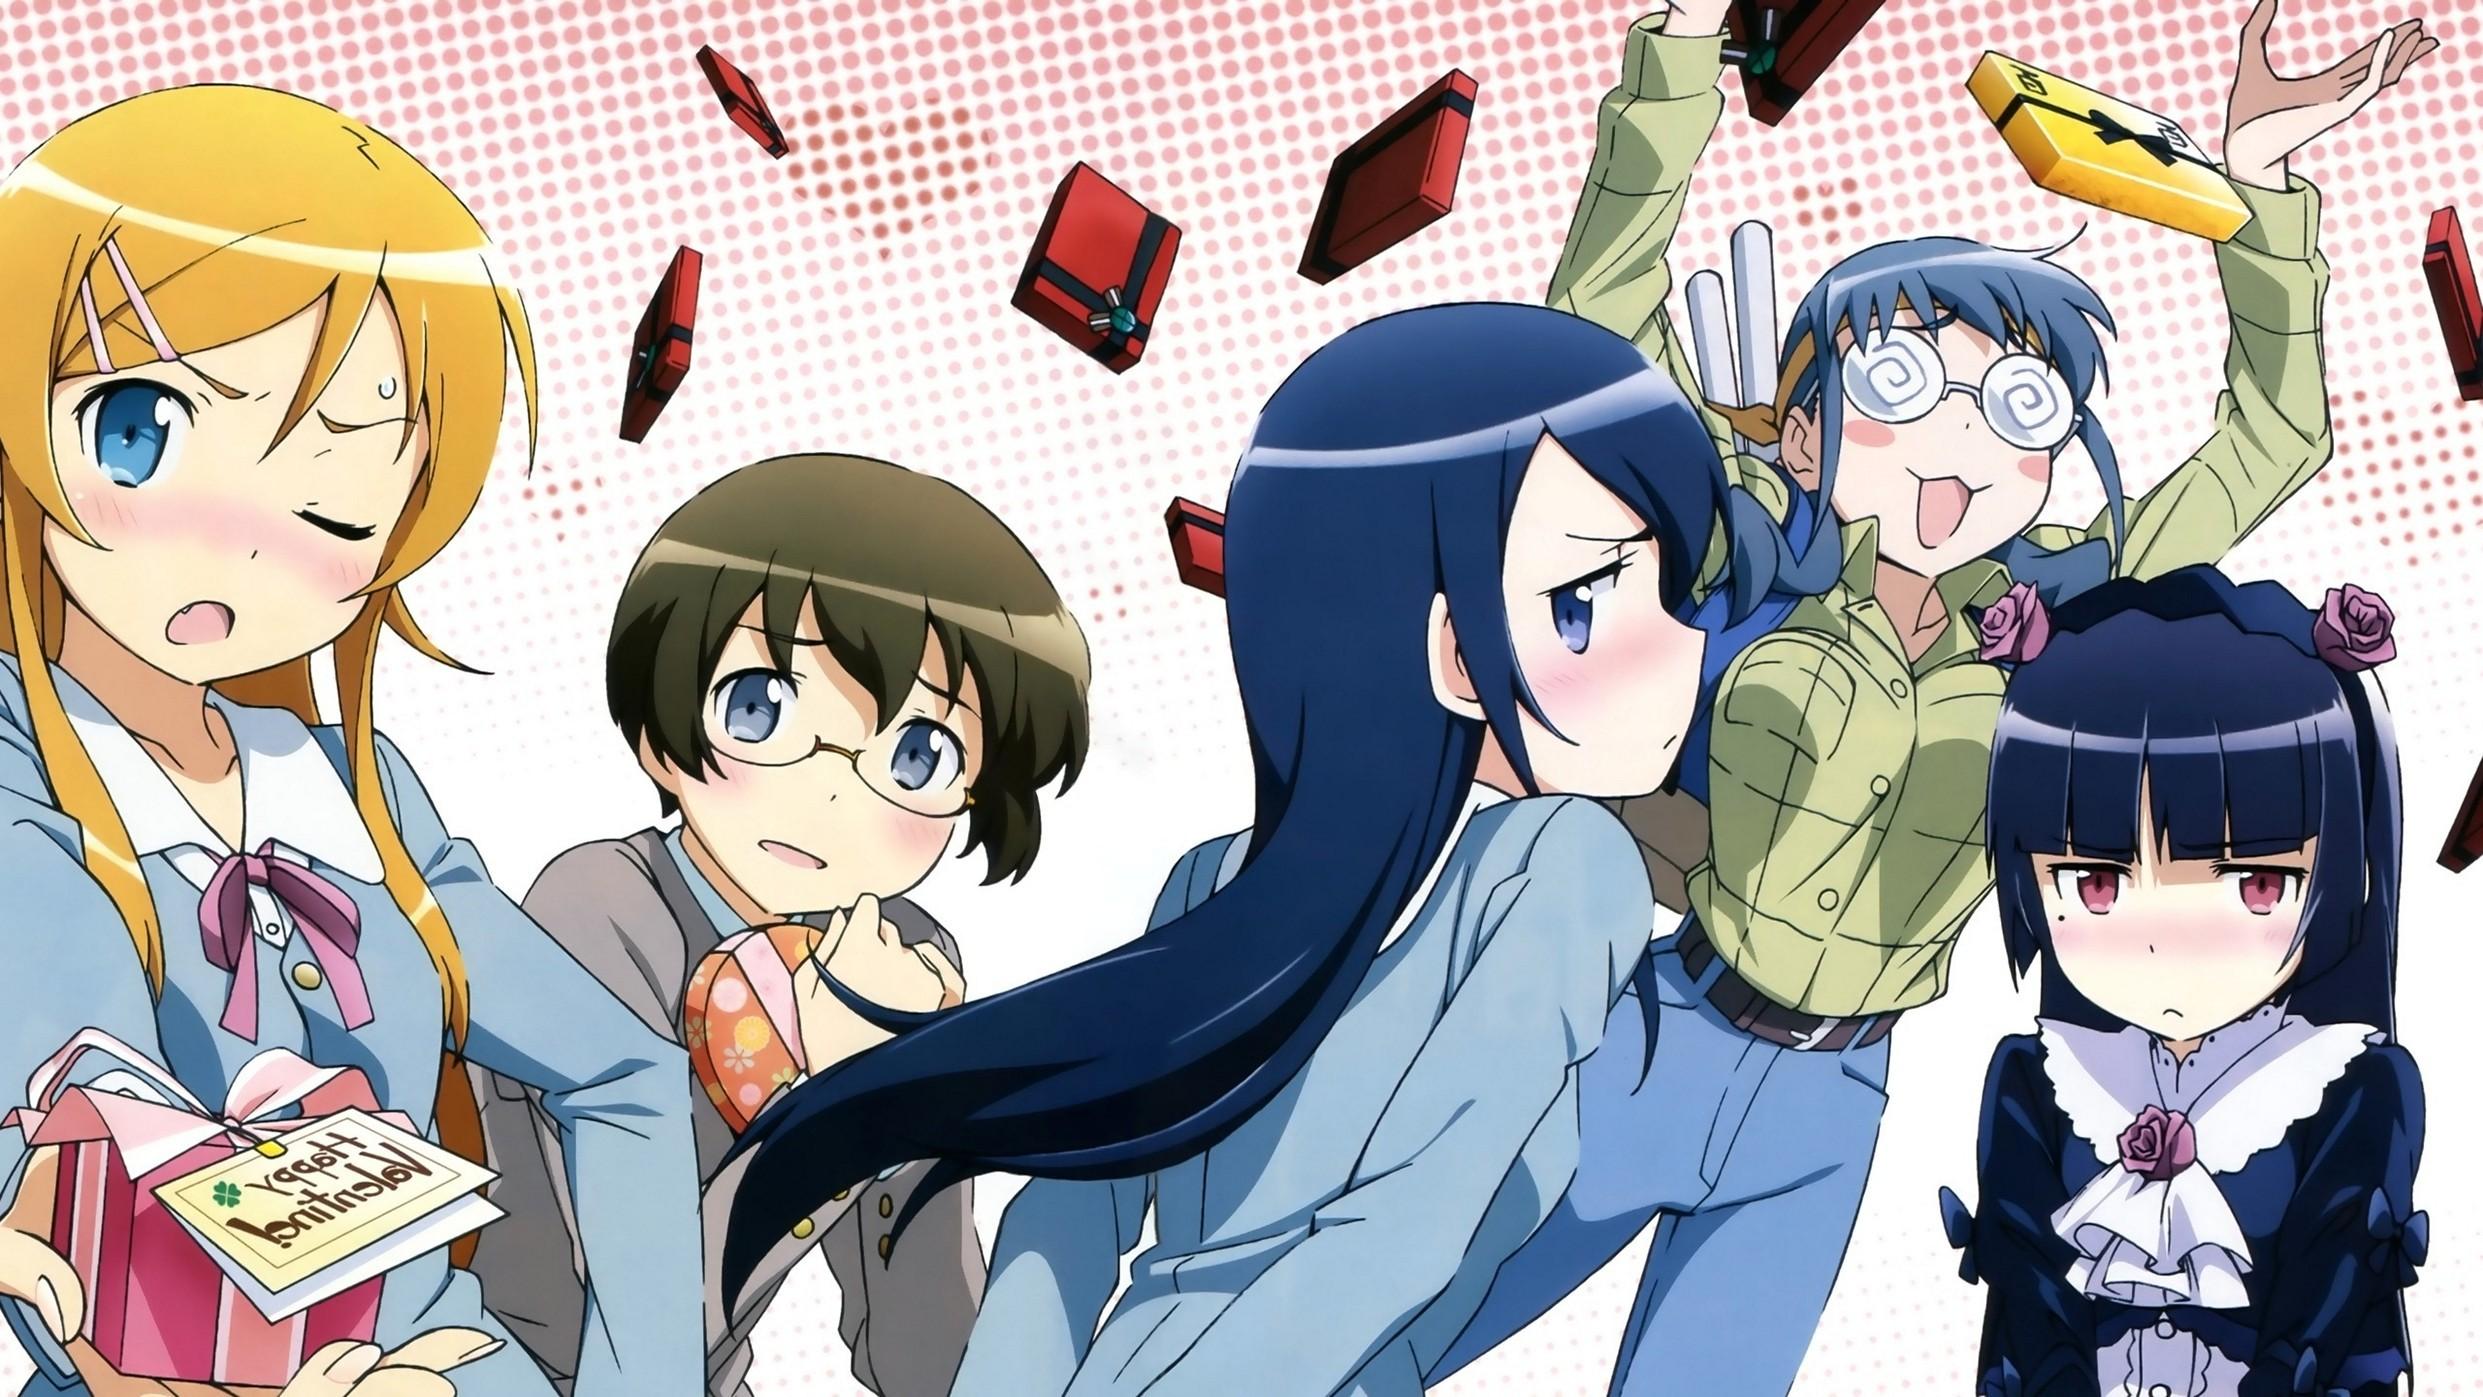 Girls Gifts Frustration Elation Emotion Legendary Anime Android Wallpaper